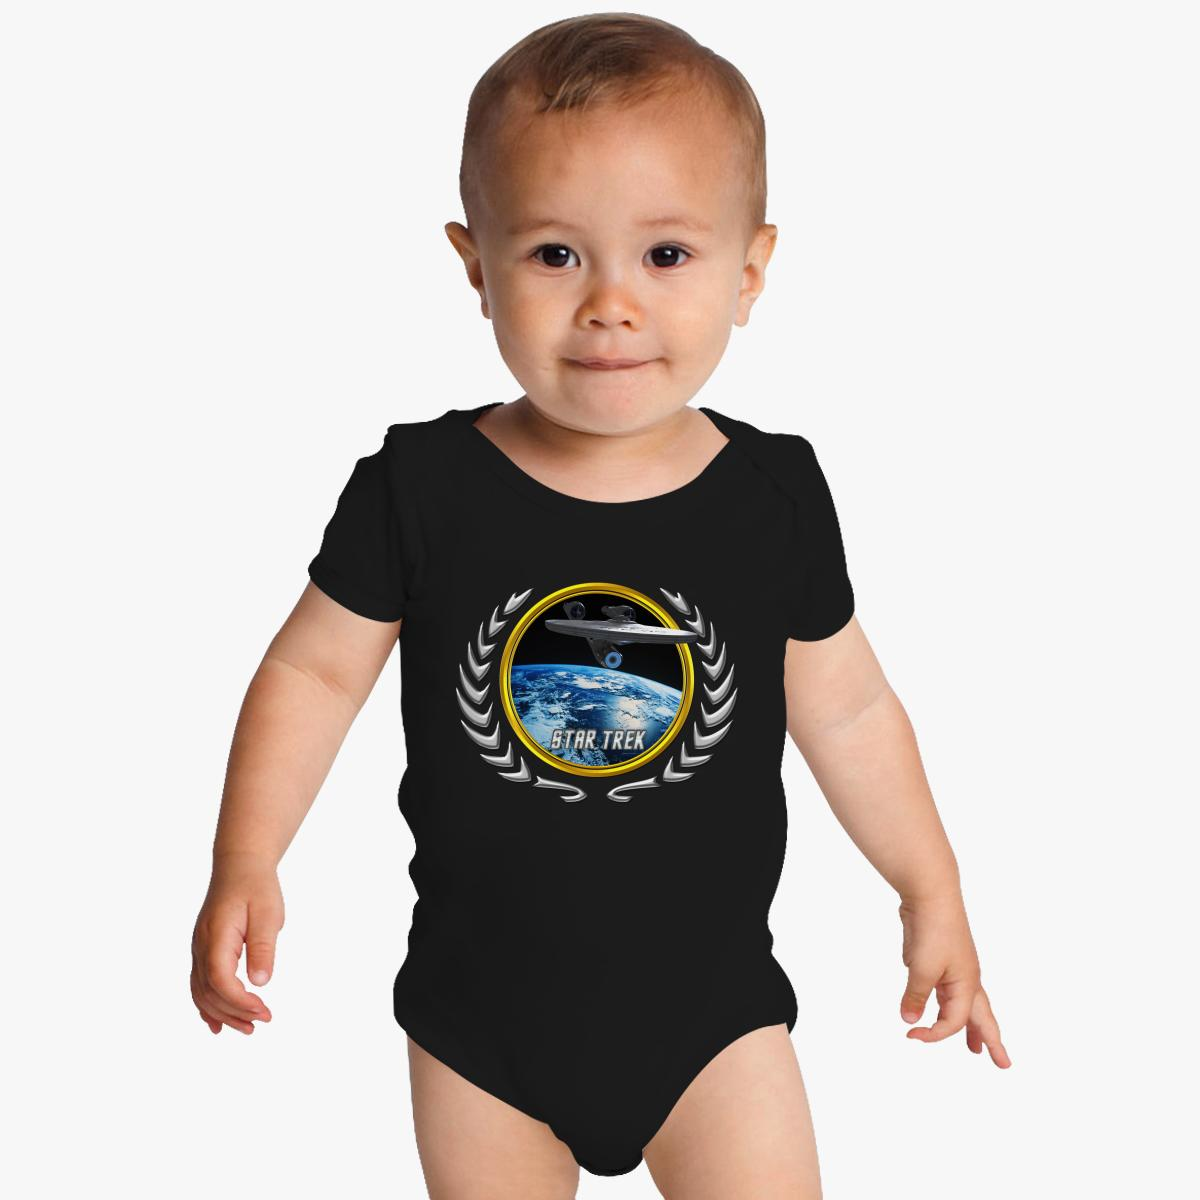 Buy Star trek Federation Planets Enterprise 2009 Baby Onesies, 526487